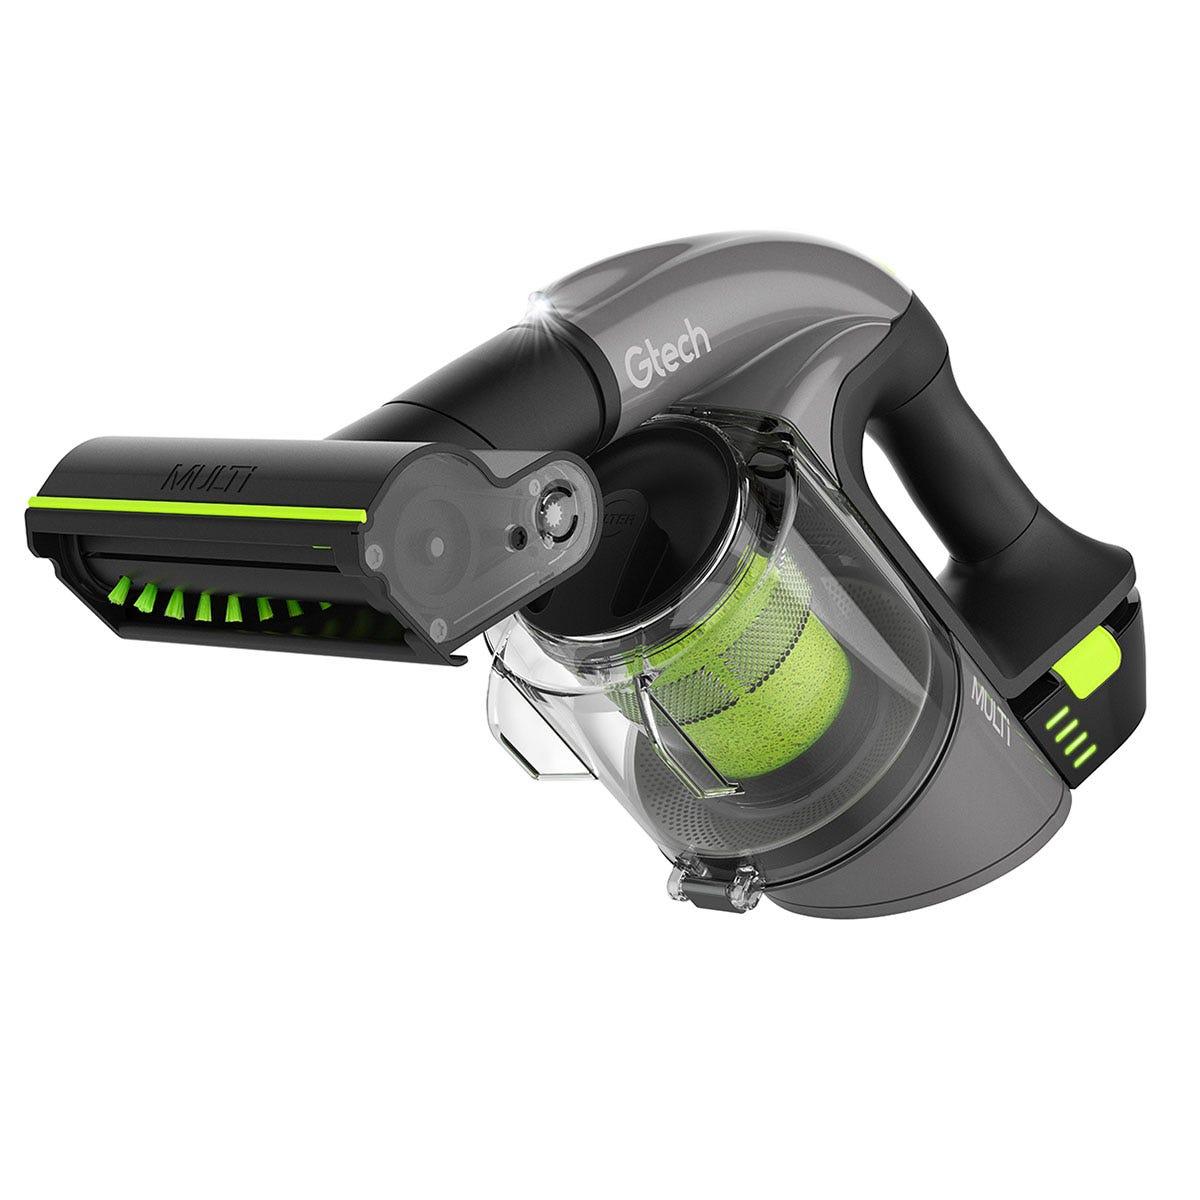 Gtech 1-03-149 Multi Vacuum Cleaner - Grey & Green